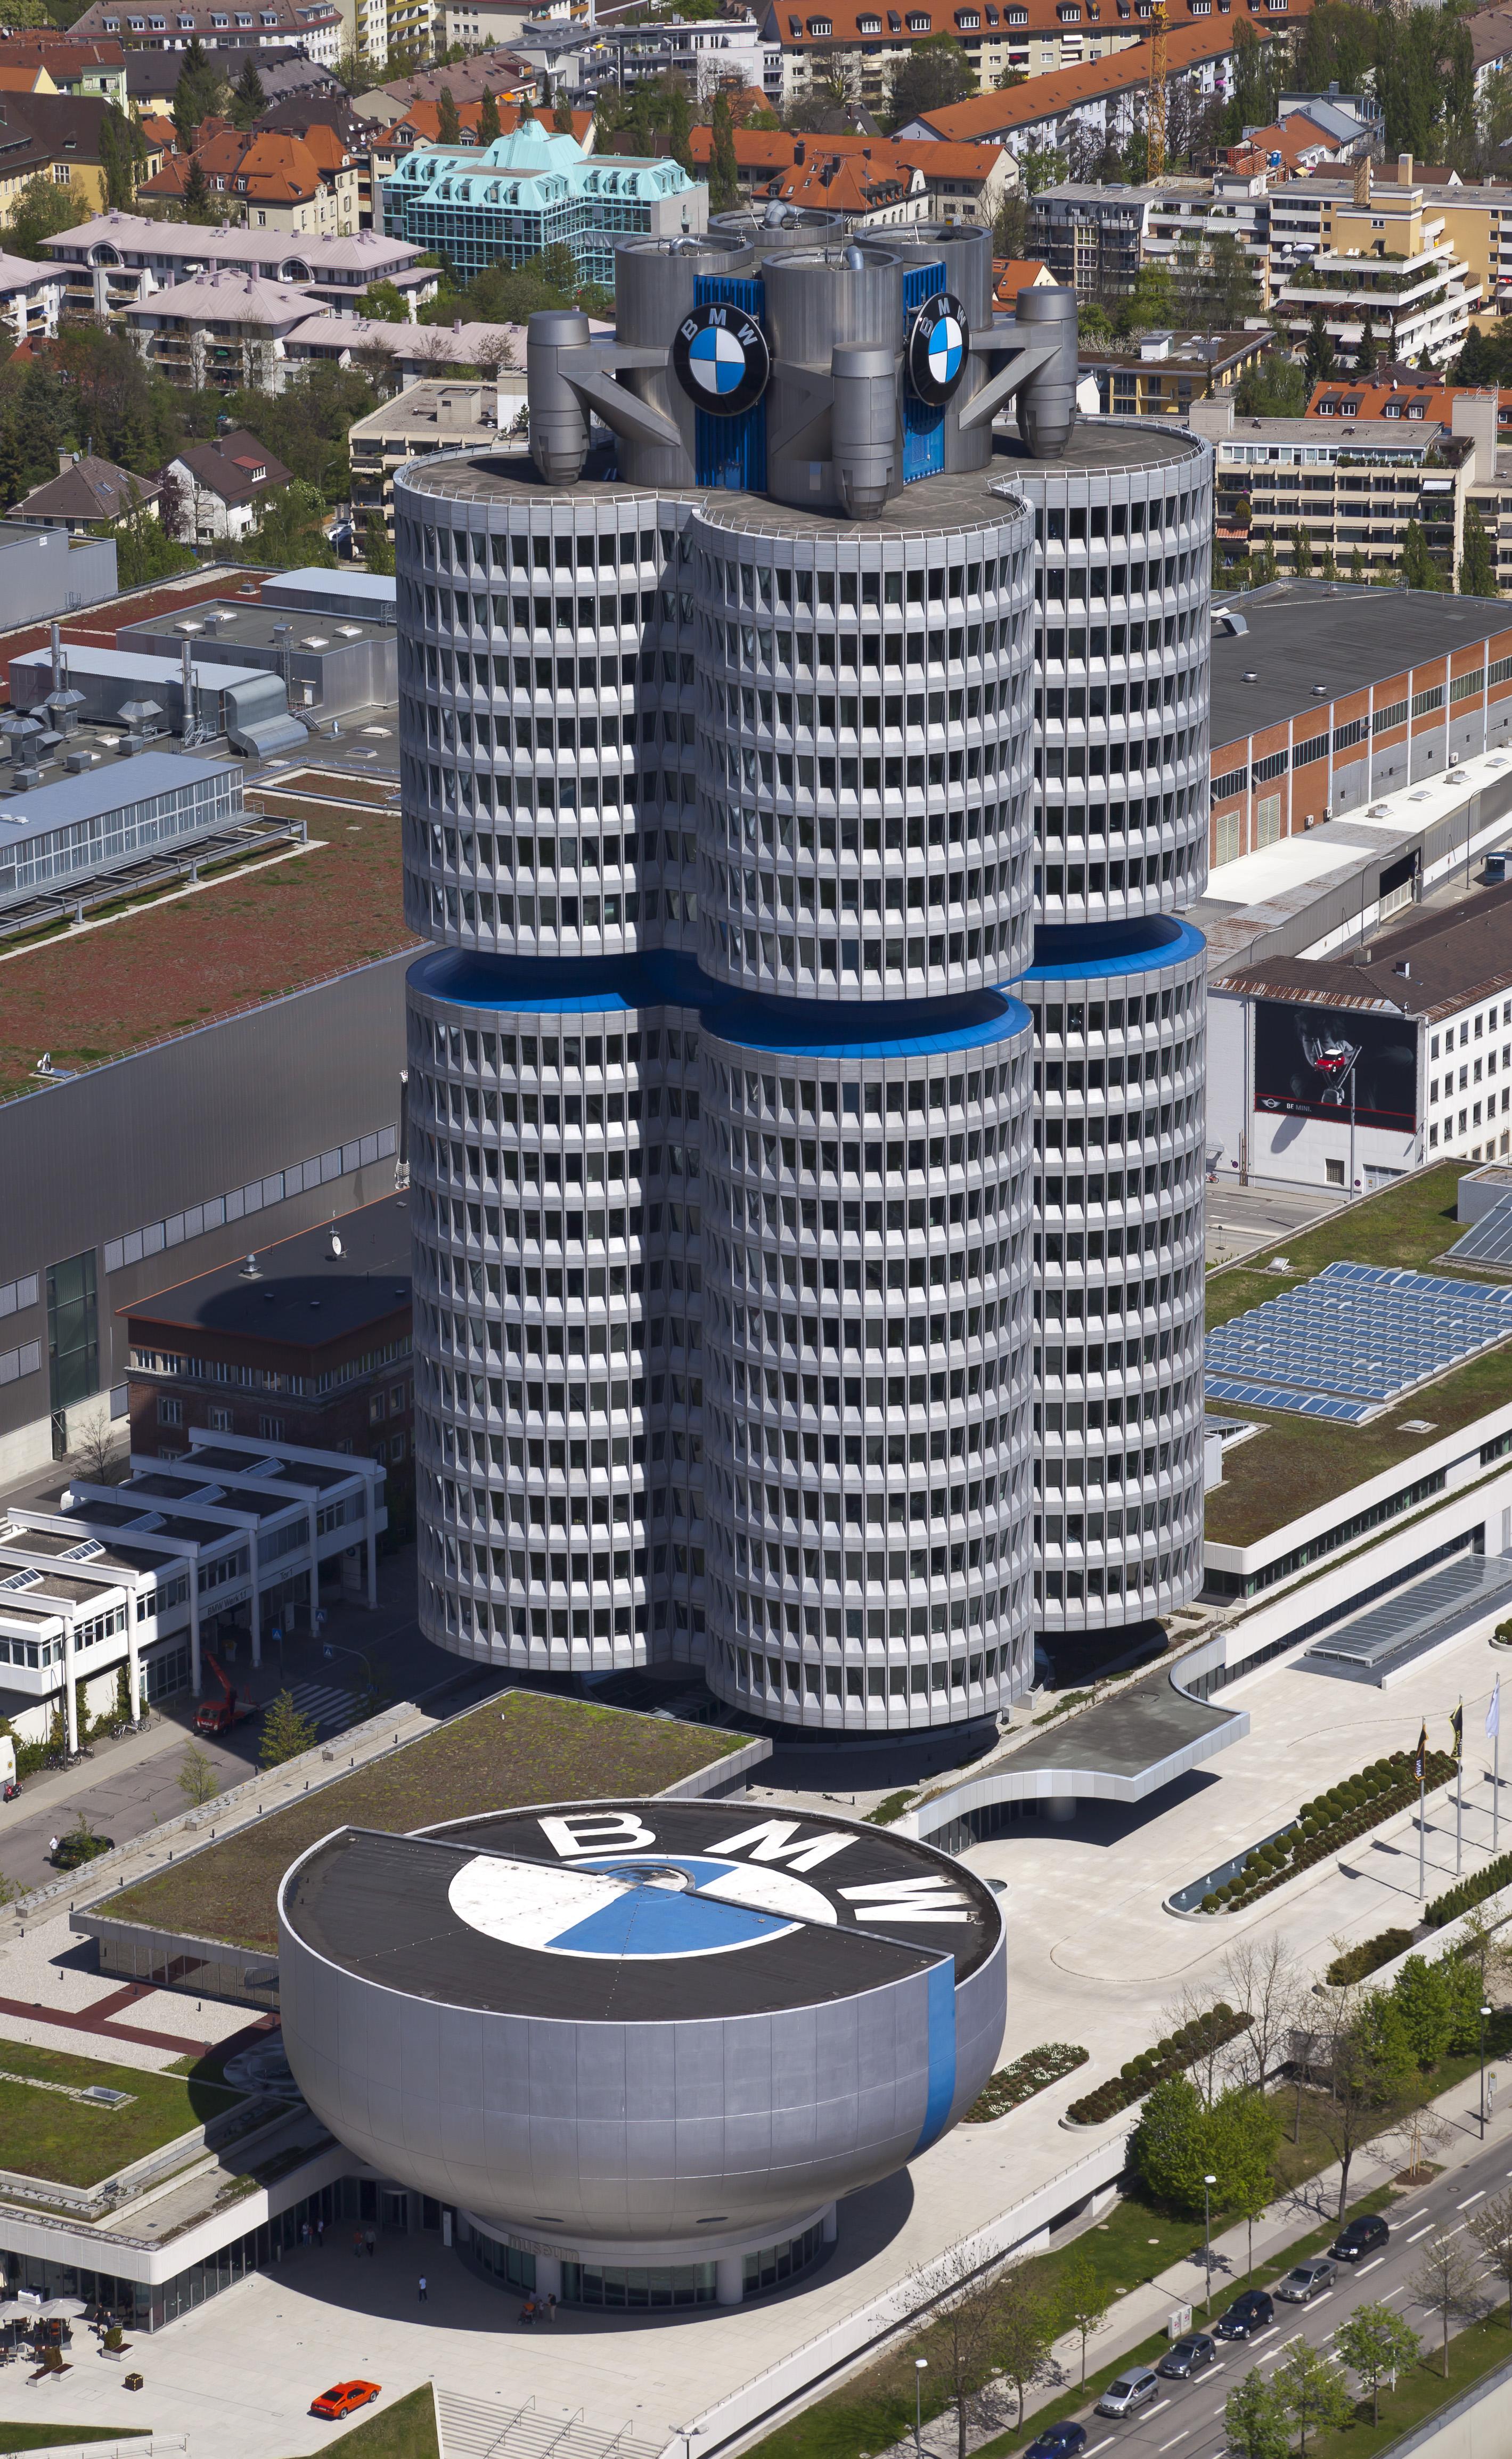 Top 10 Most Impressive Car Company Headquarters In The World 1